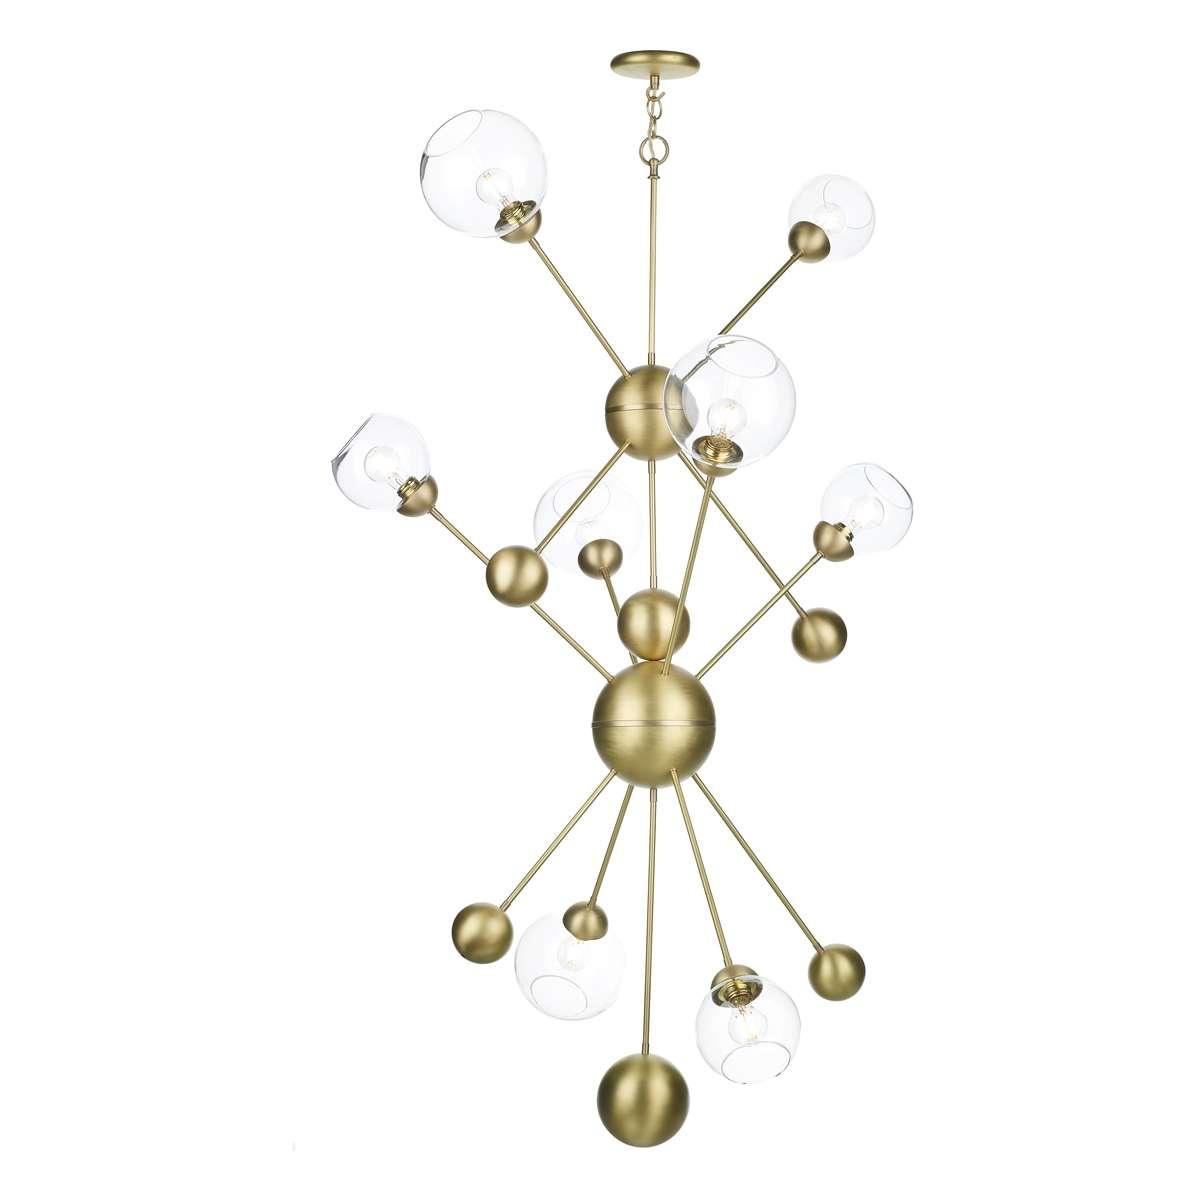 Cosmos 8 Light Pendant in Butter Brass